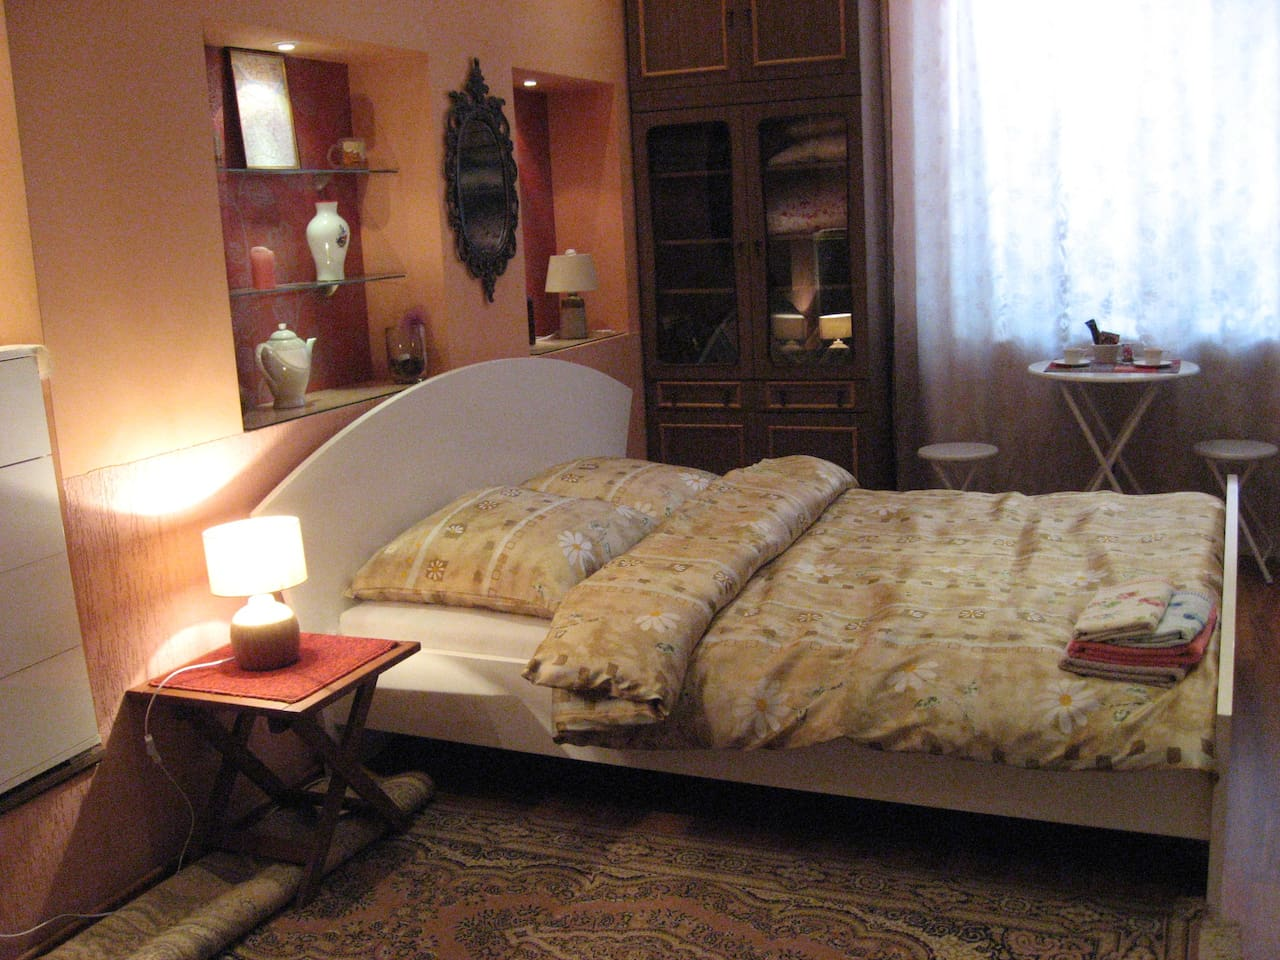 the bed 160 cm x  200 cm